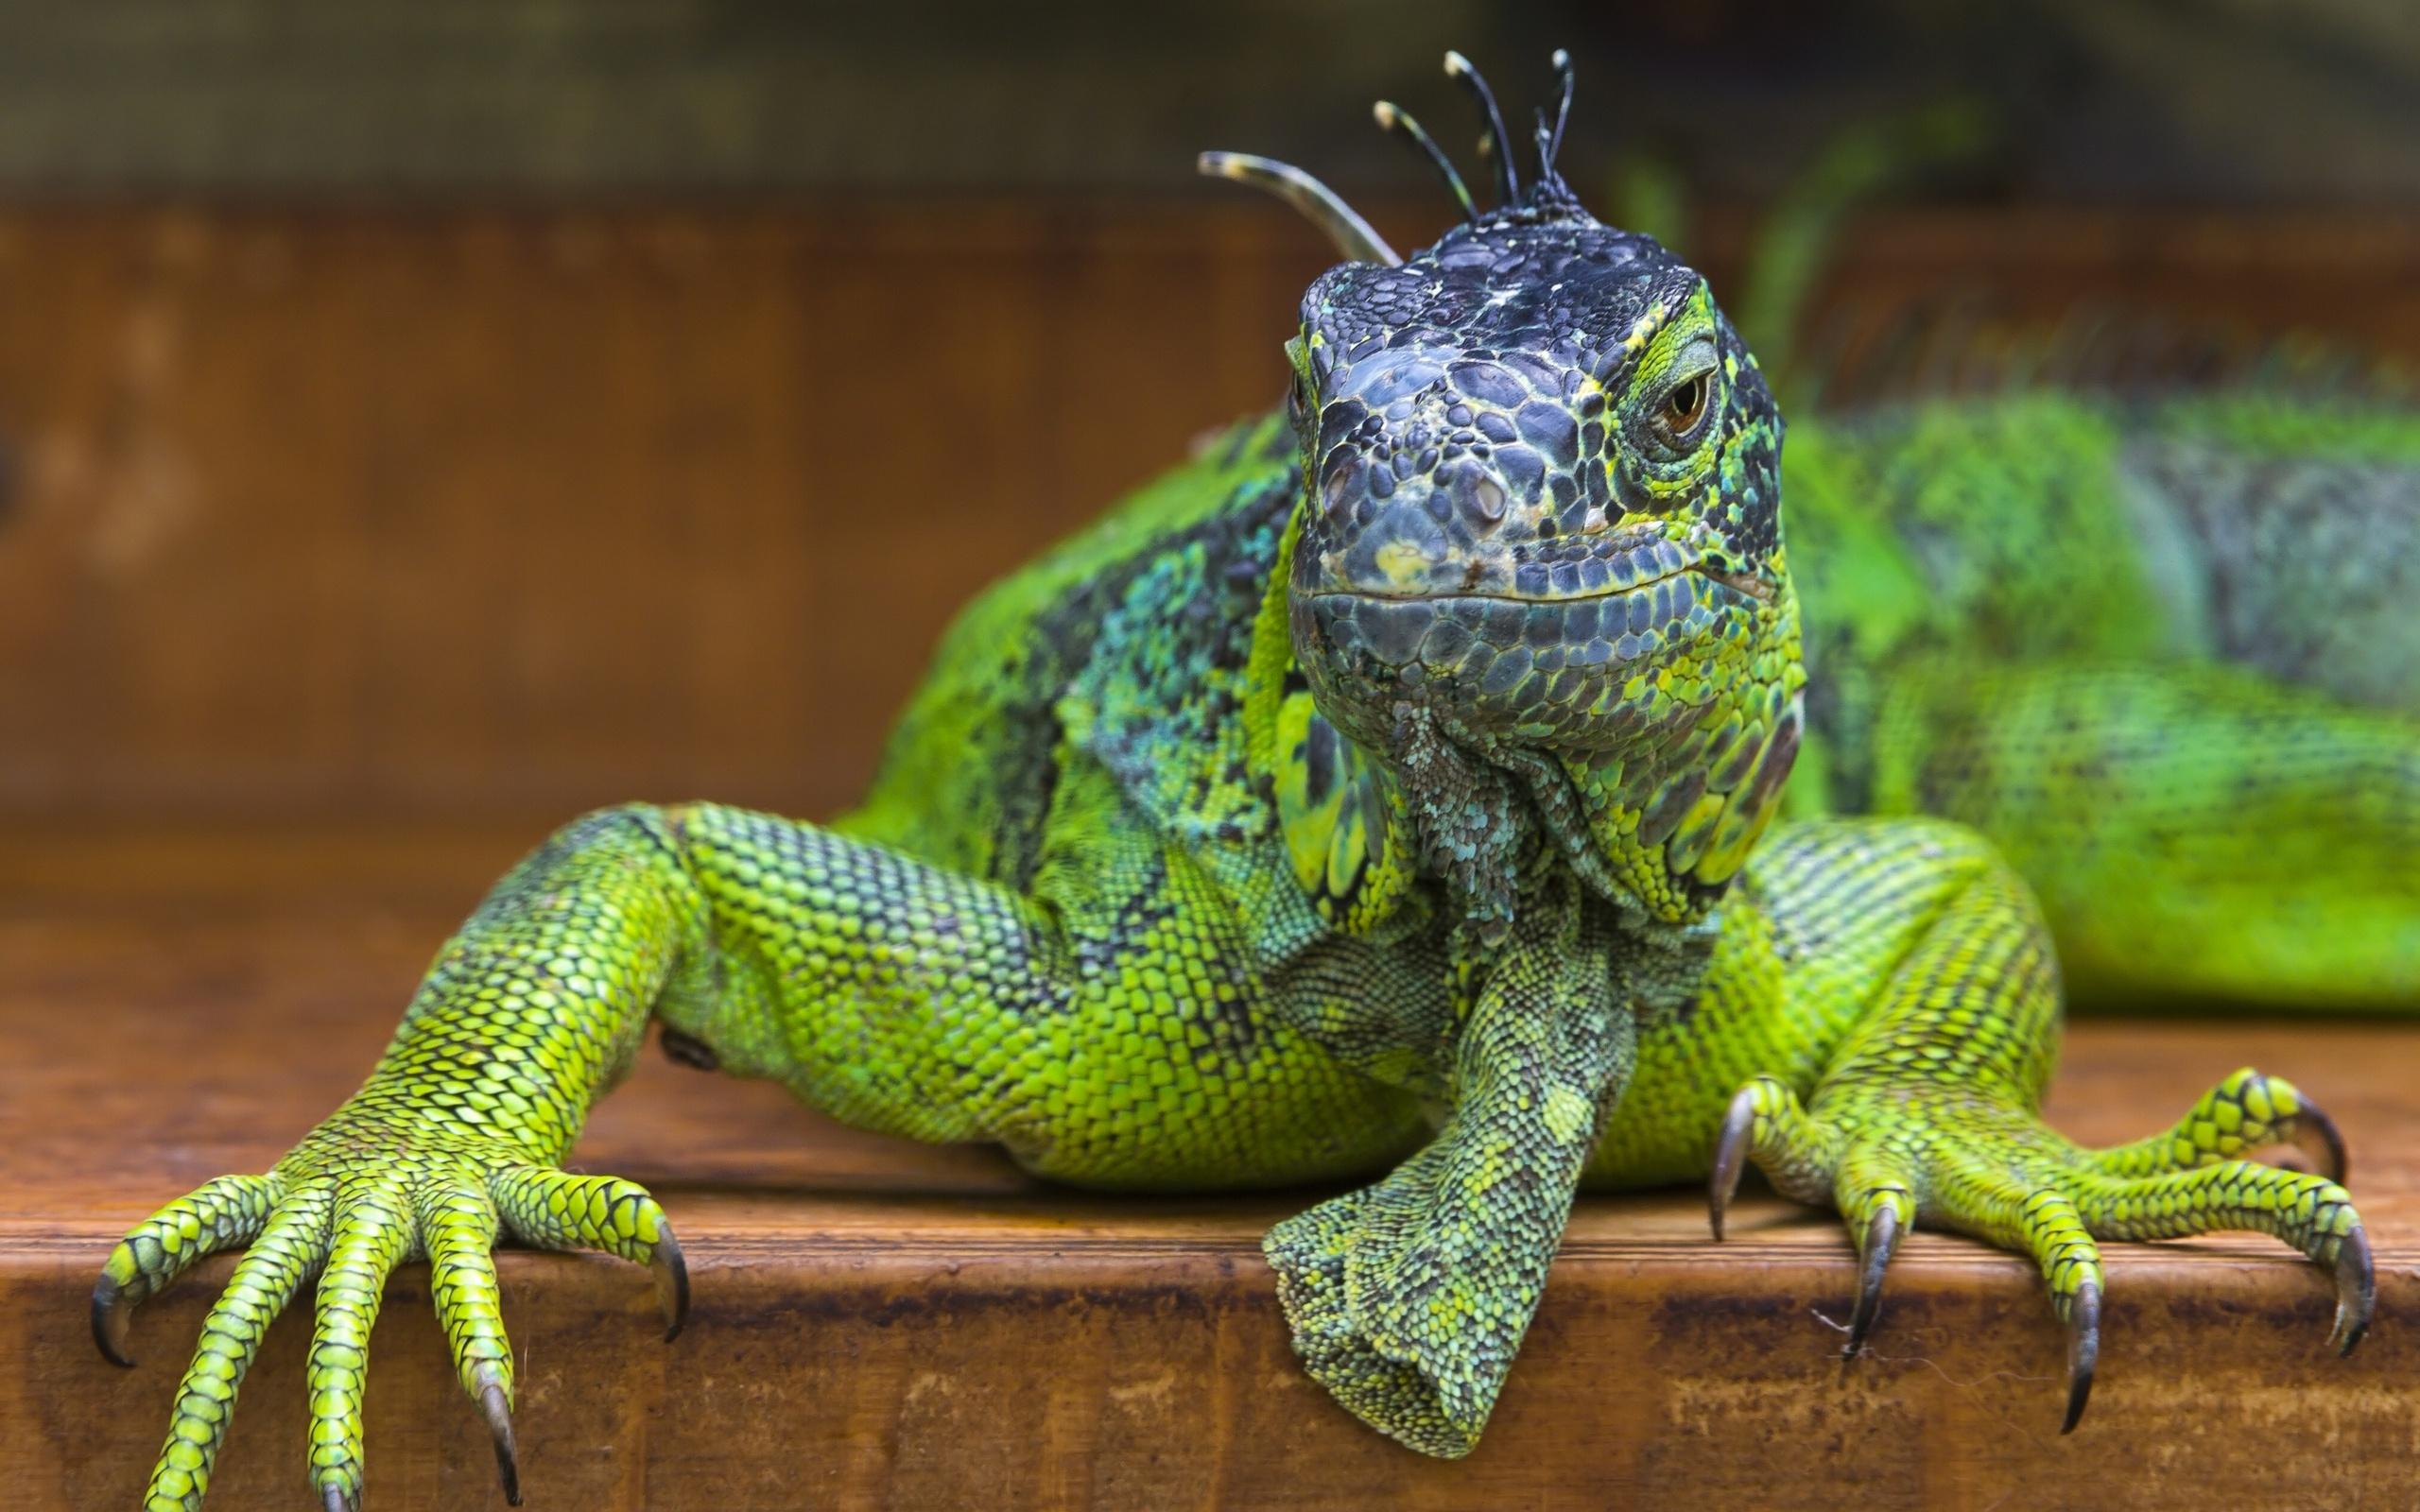 Green Iguana Wallpaper - WallpaperSafari